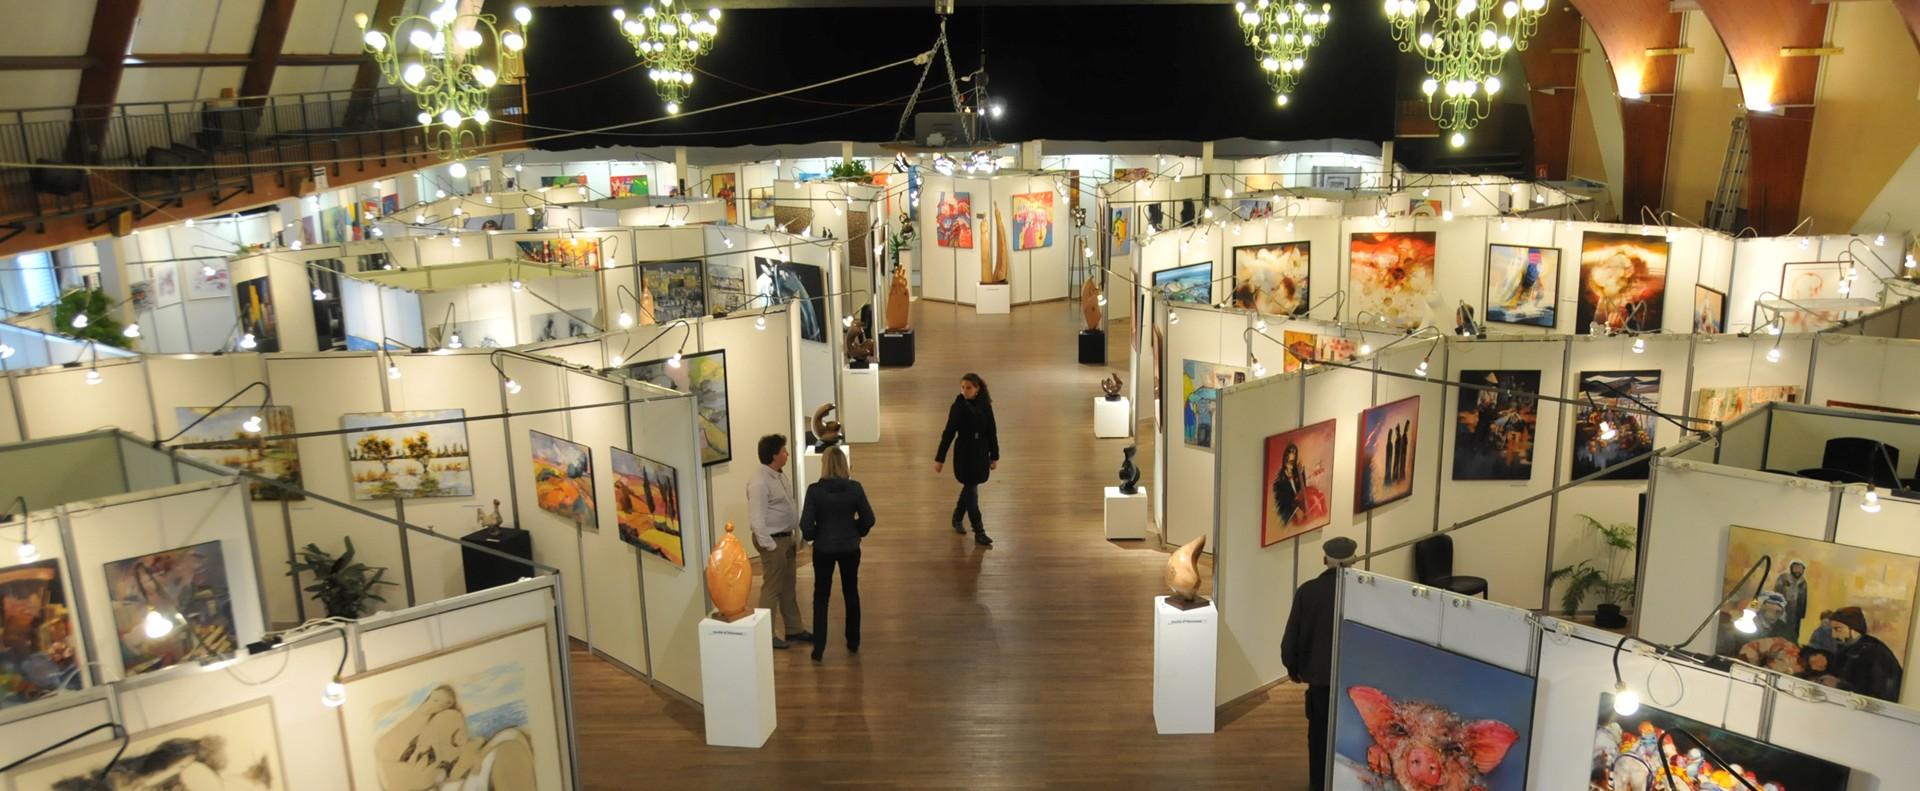 actu-salon-des-arts-2016-1340